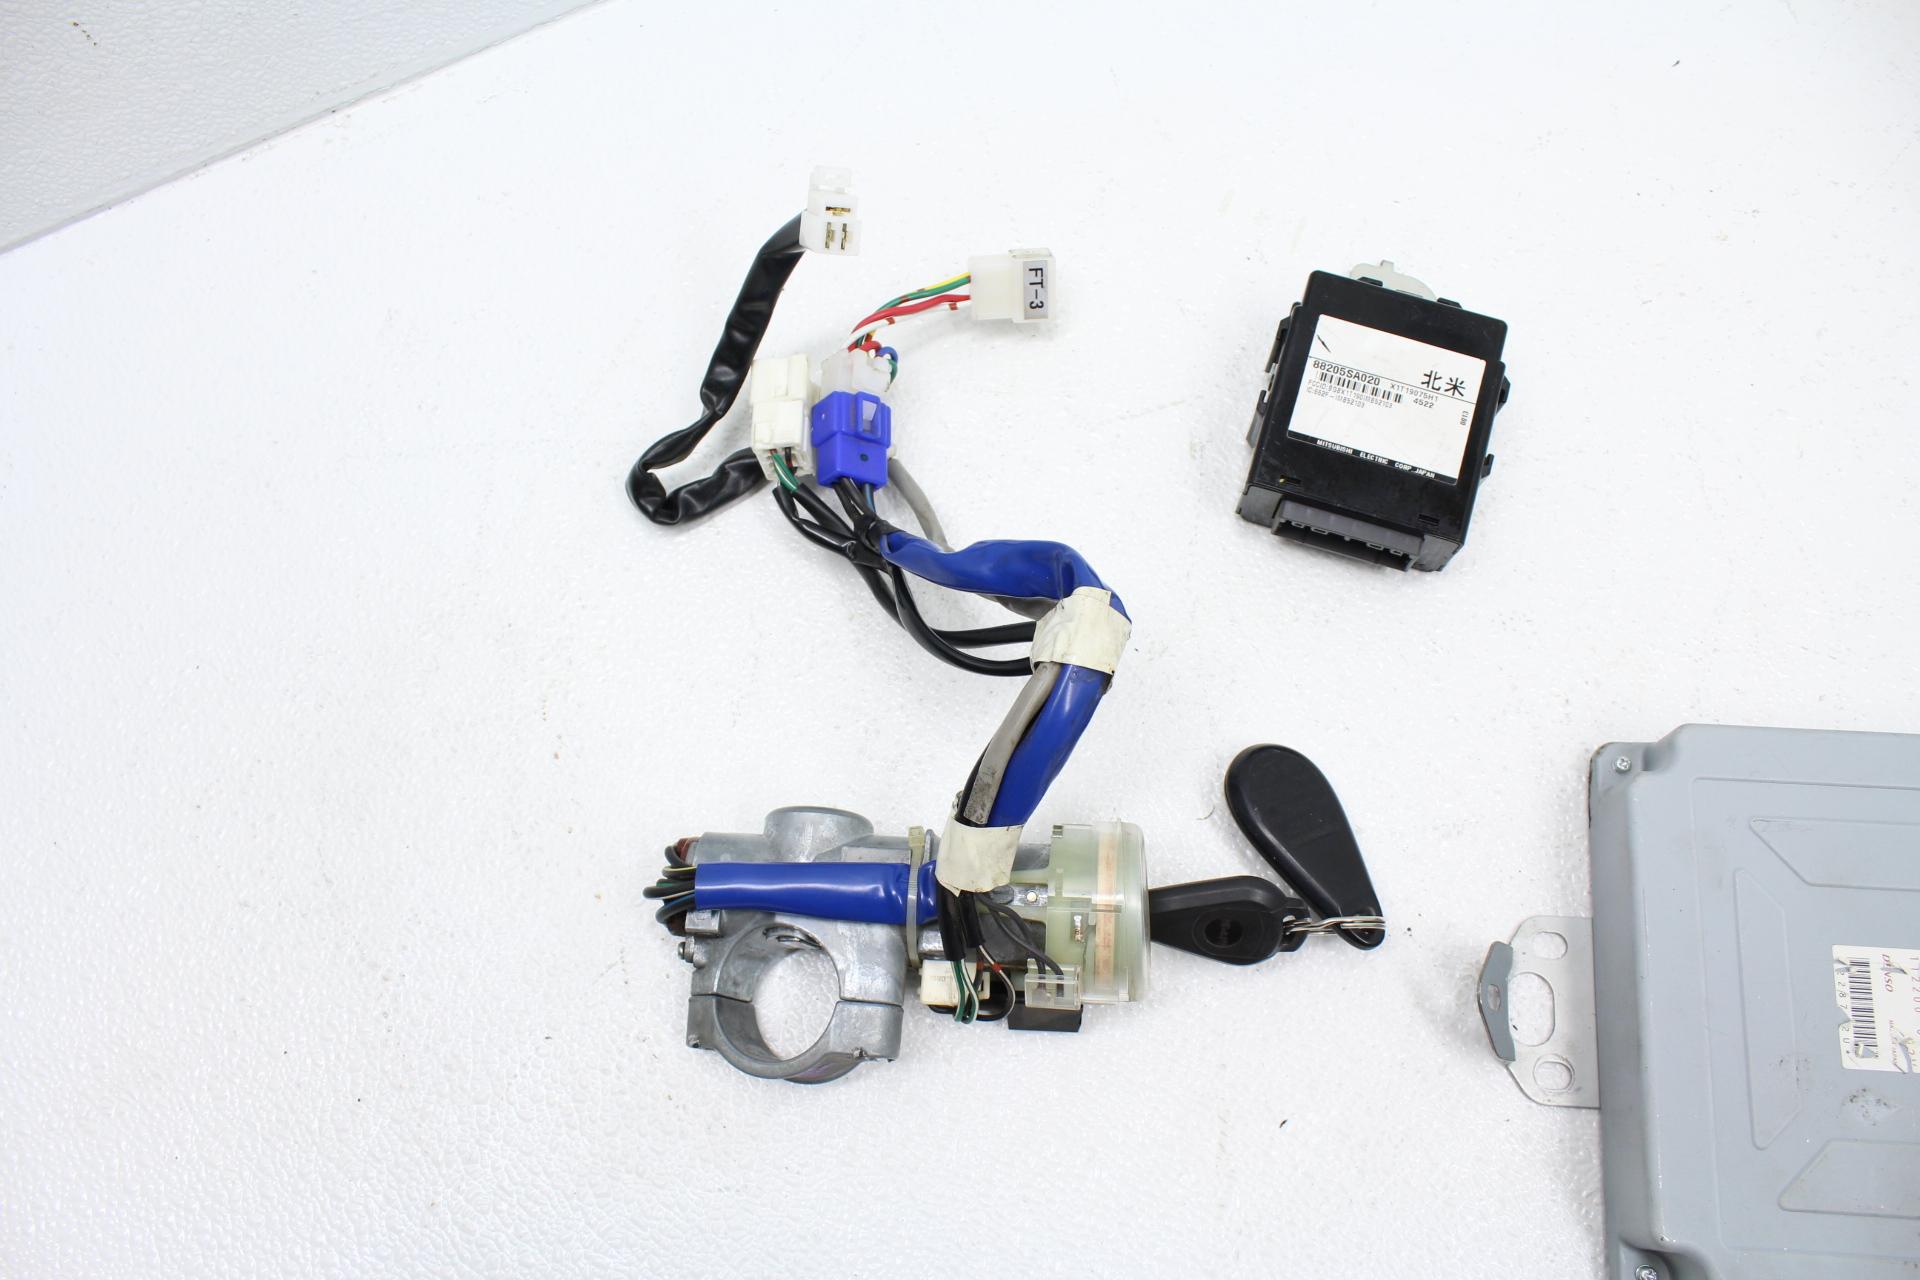 2002 subaru wrx ecu wiring diagram 1987 toyota truck radio service manual impreza install set